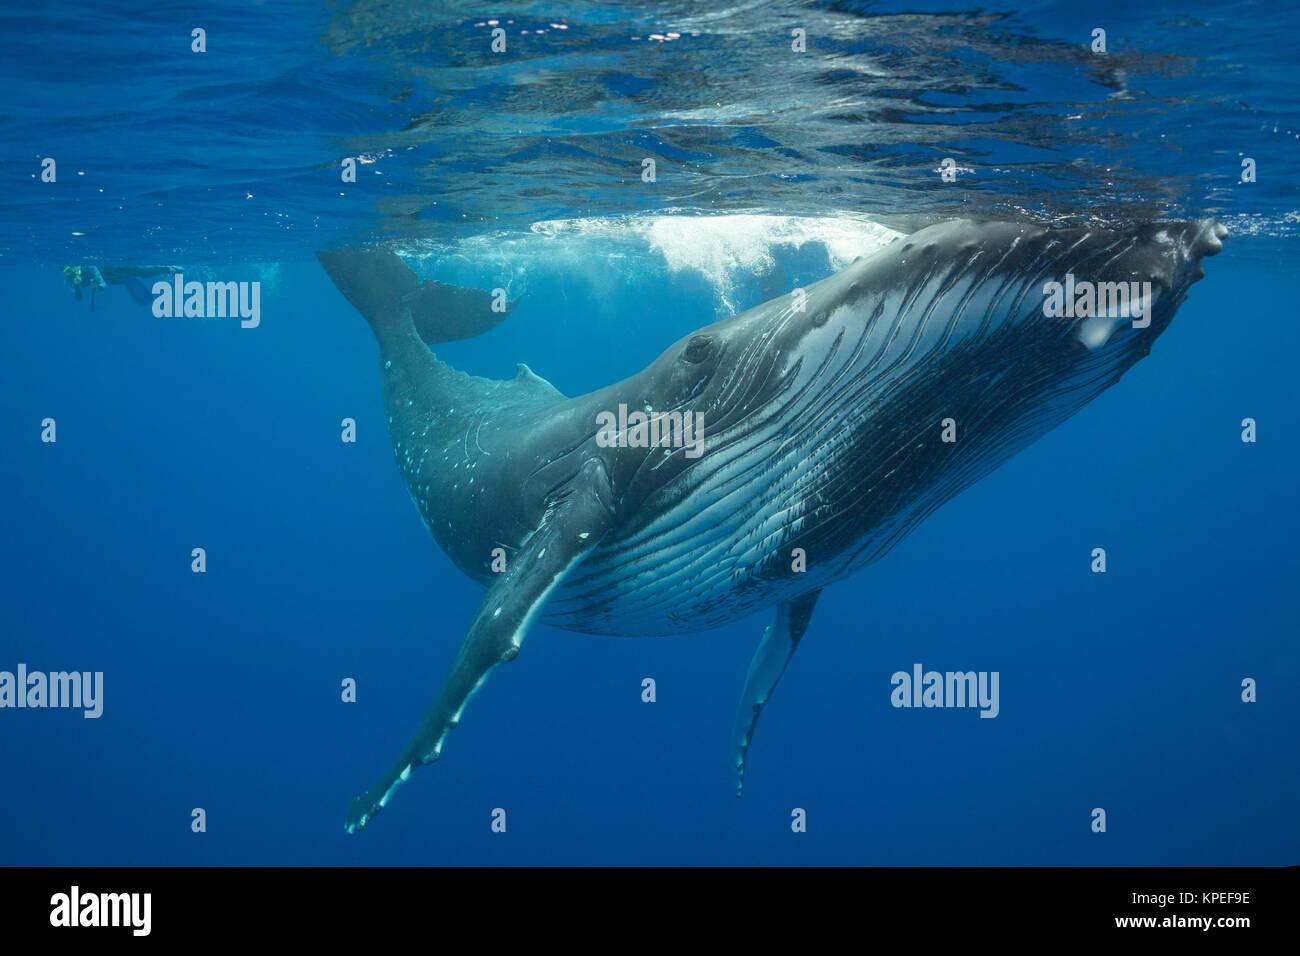 Rorqual à bosse, Megaptera novaeangliae, et les plongeurs, Vava'u, Royaume des Tonga, Pacifique Sud, MR Photo Stock